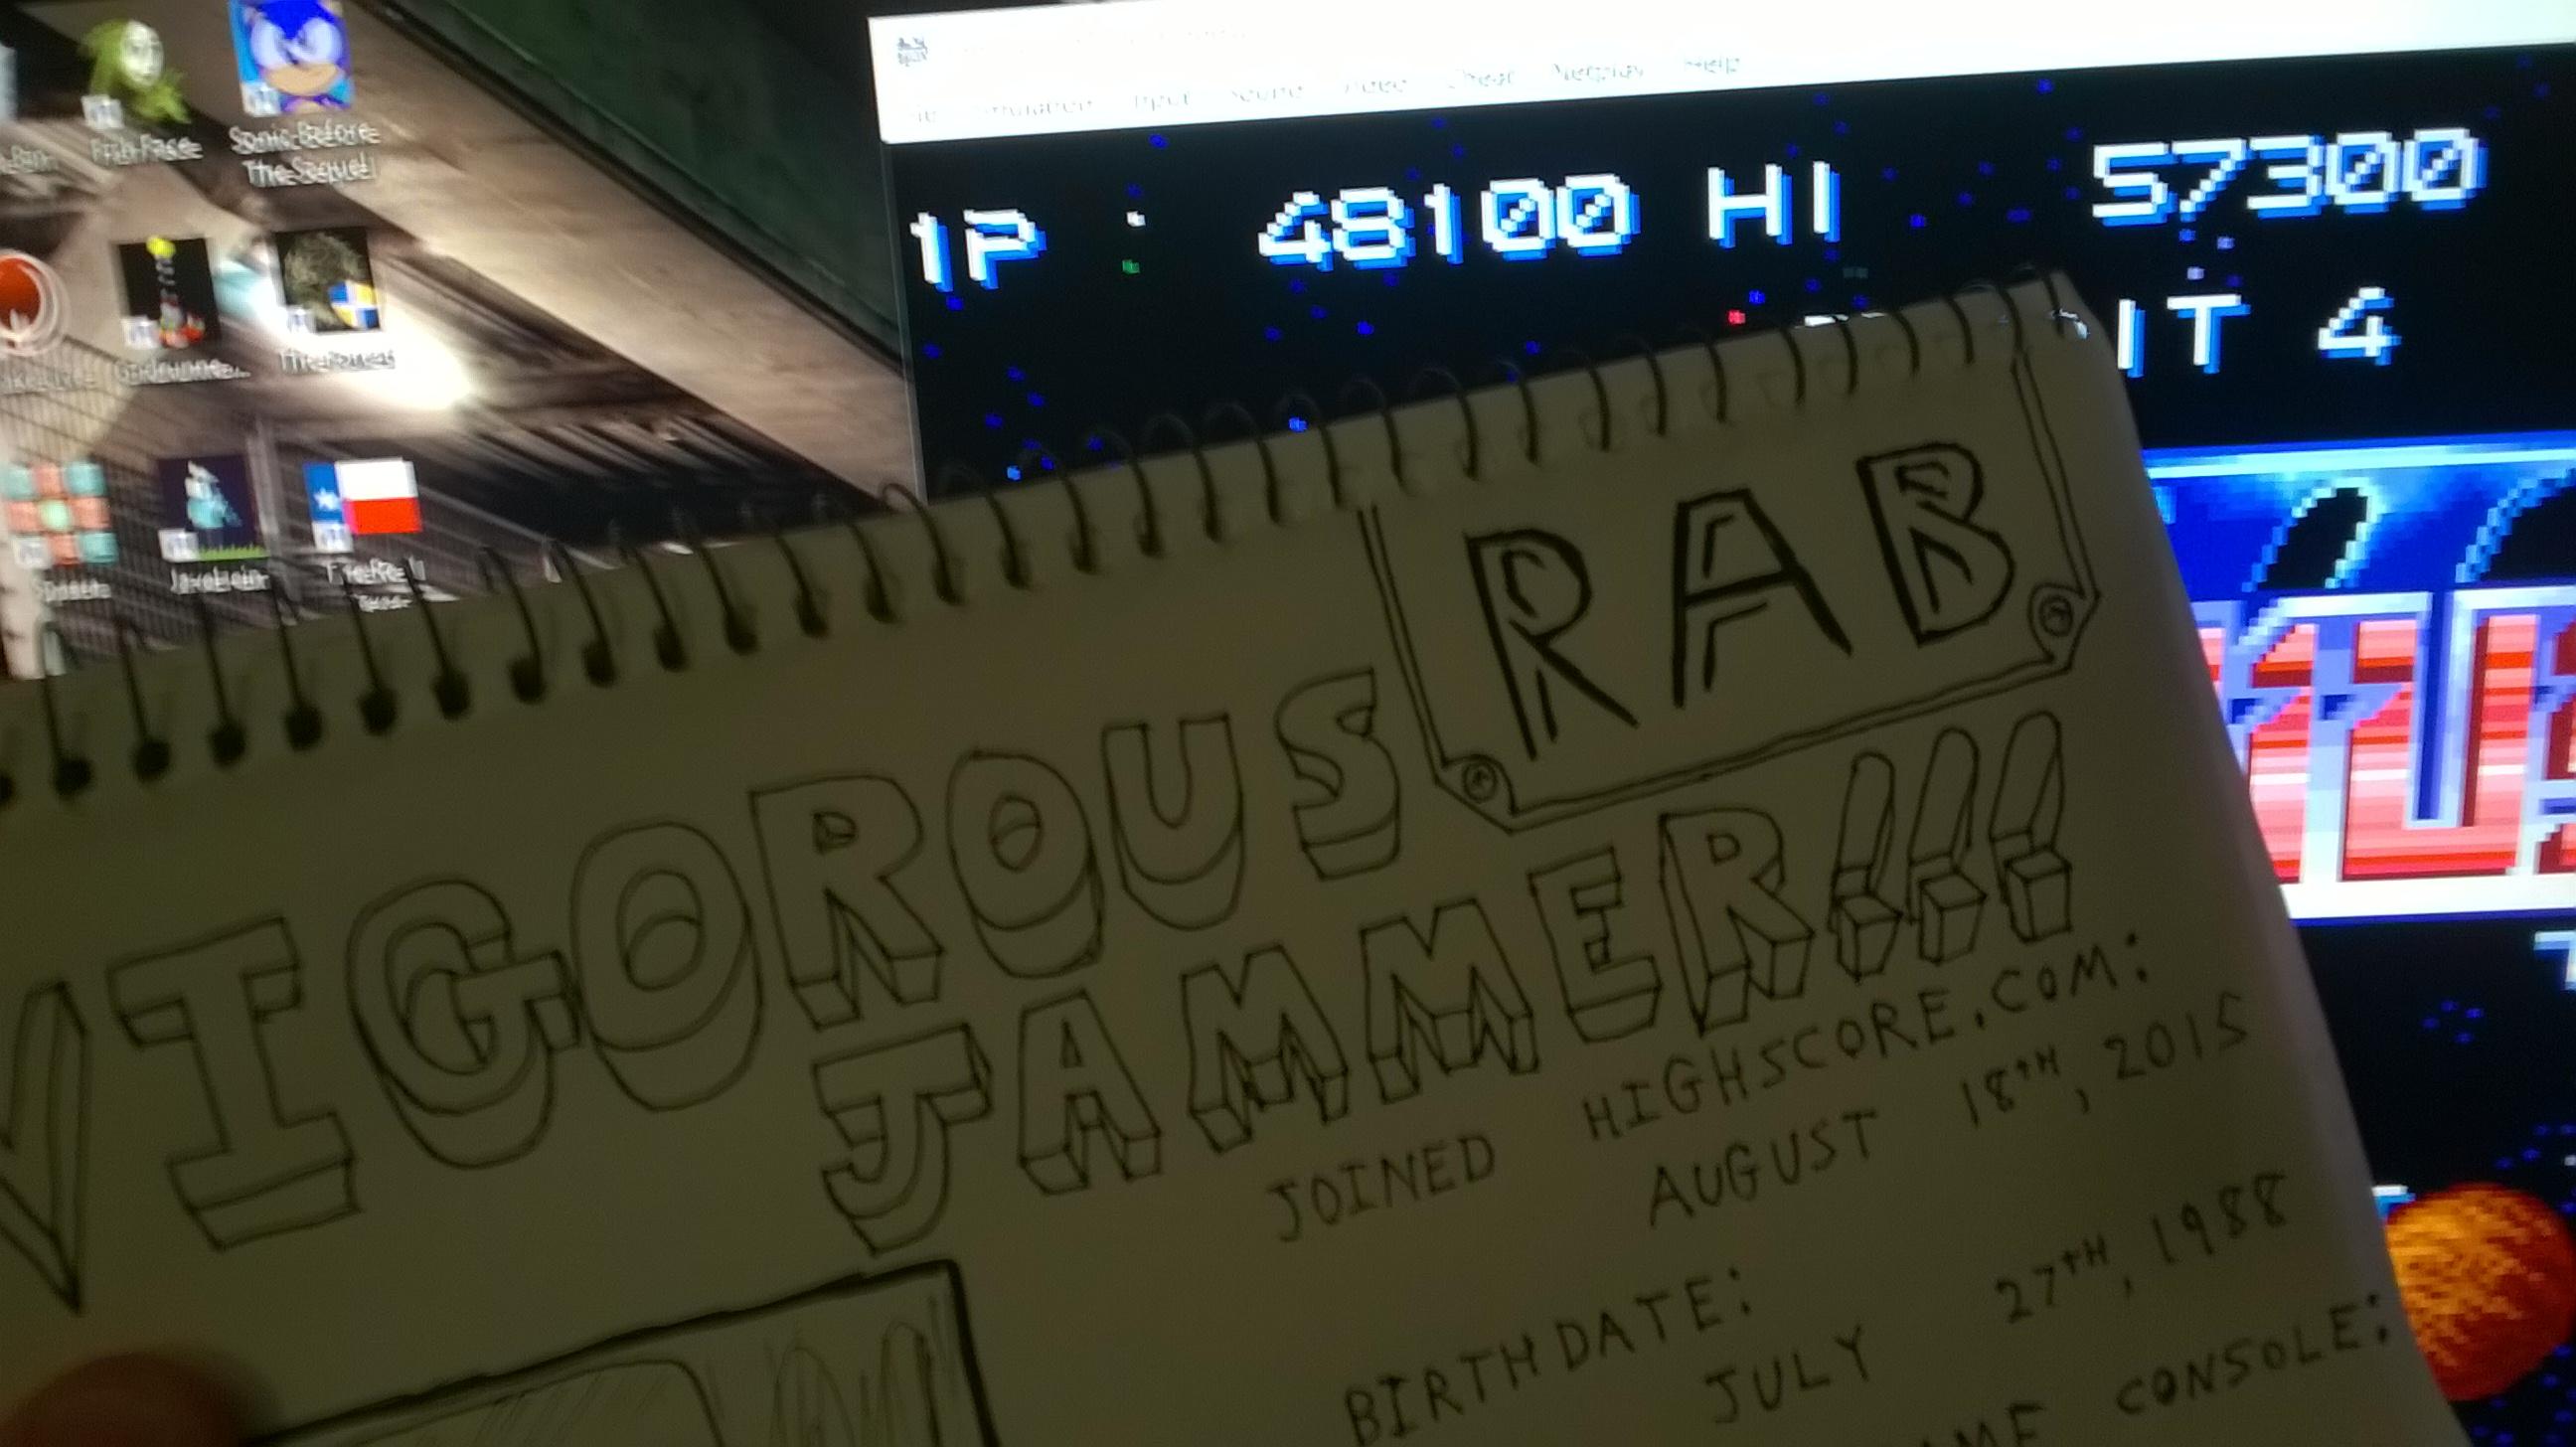 vigorousjammer: Gradius III (SNES/Super Famicom Emulated) 48,100 points on 2015-08-31 00:30:09